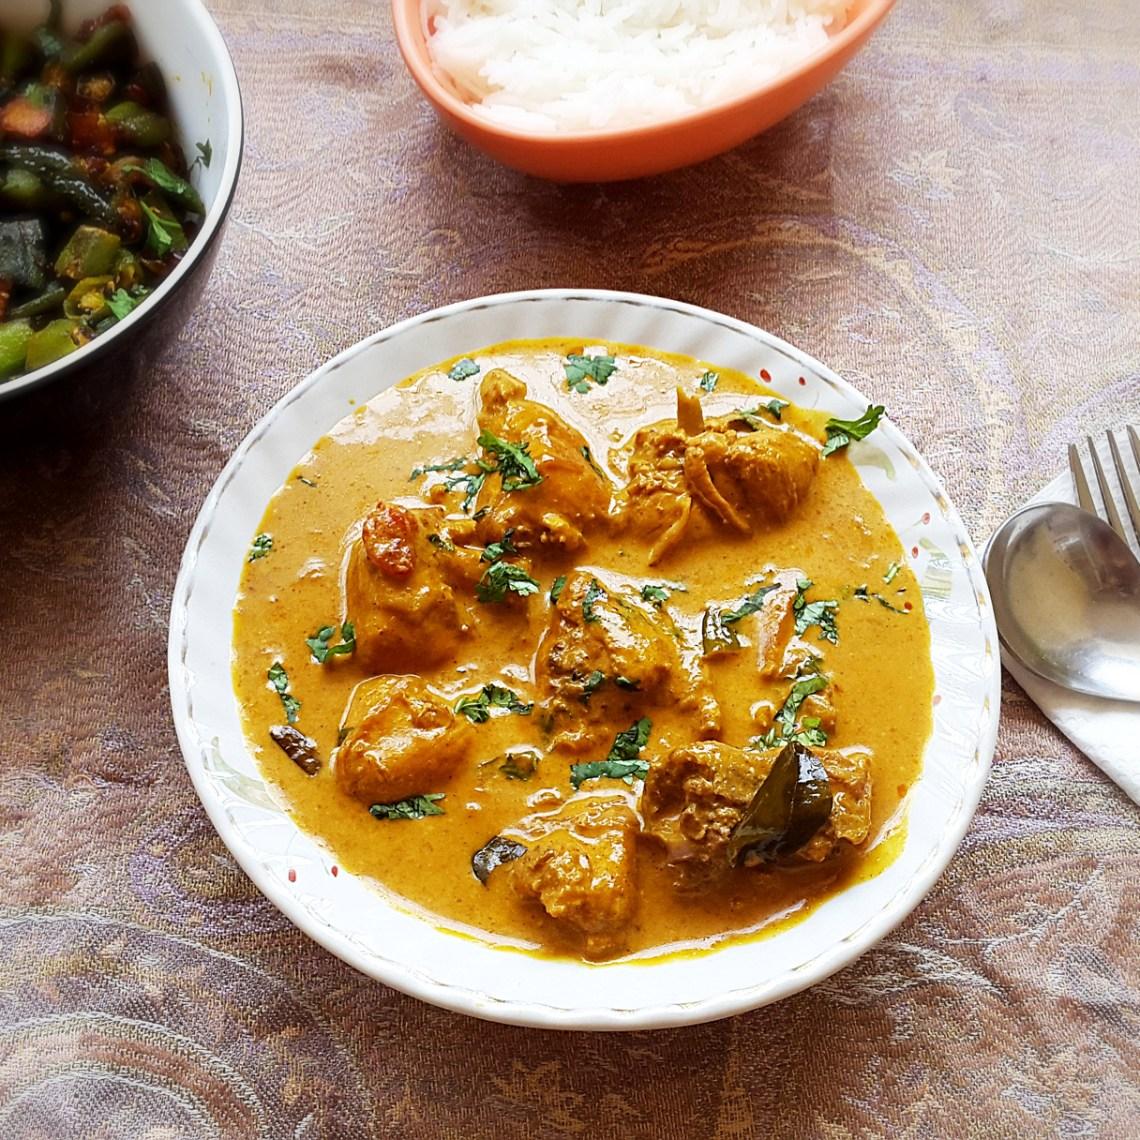 Chicken coconut curry recipe - Chicken with coconut milk ...